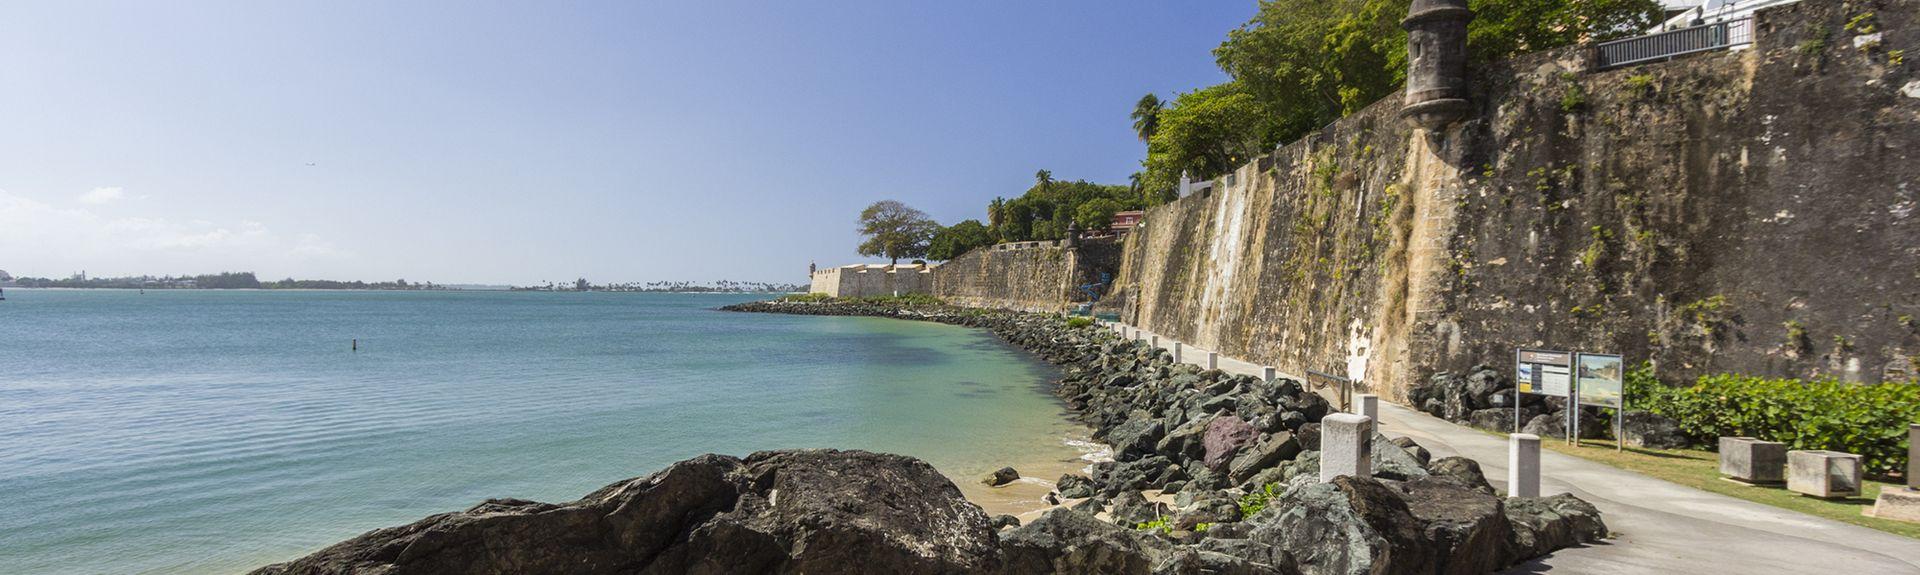 Loiza, Porto Rico